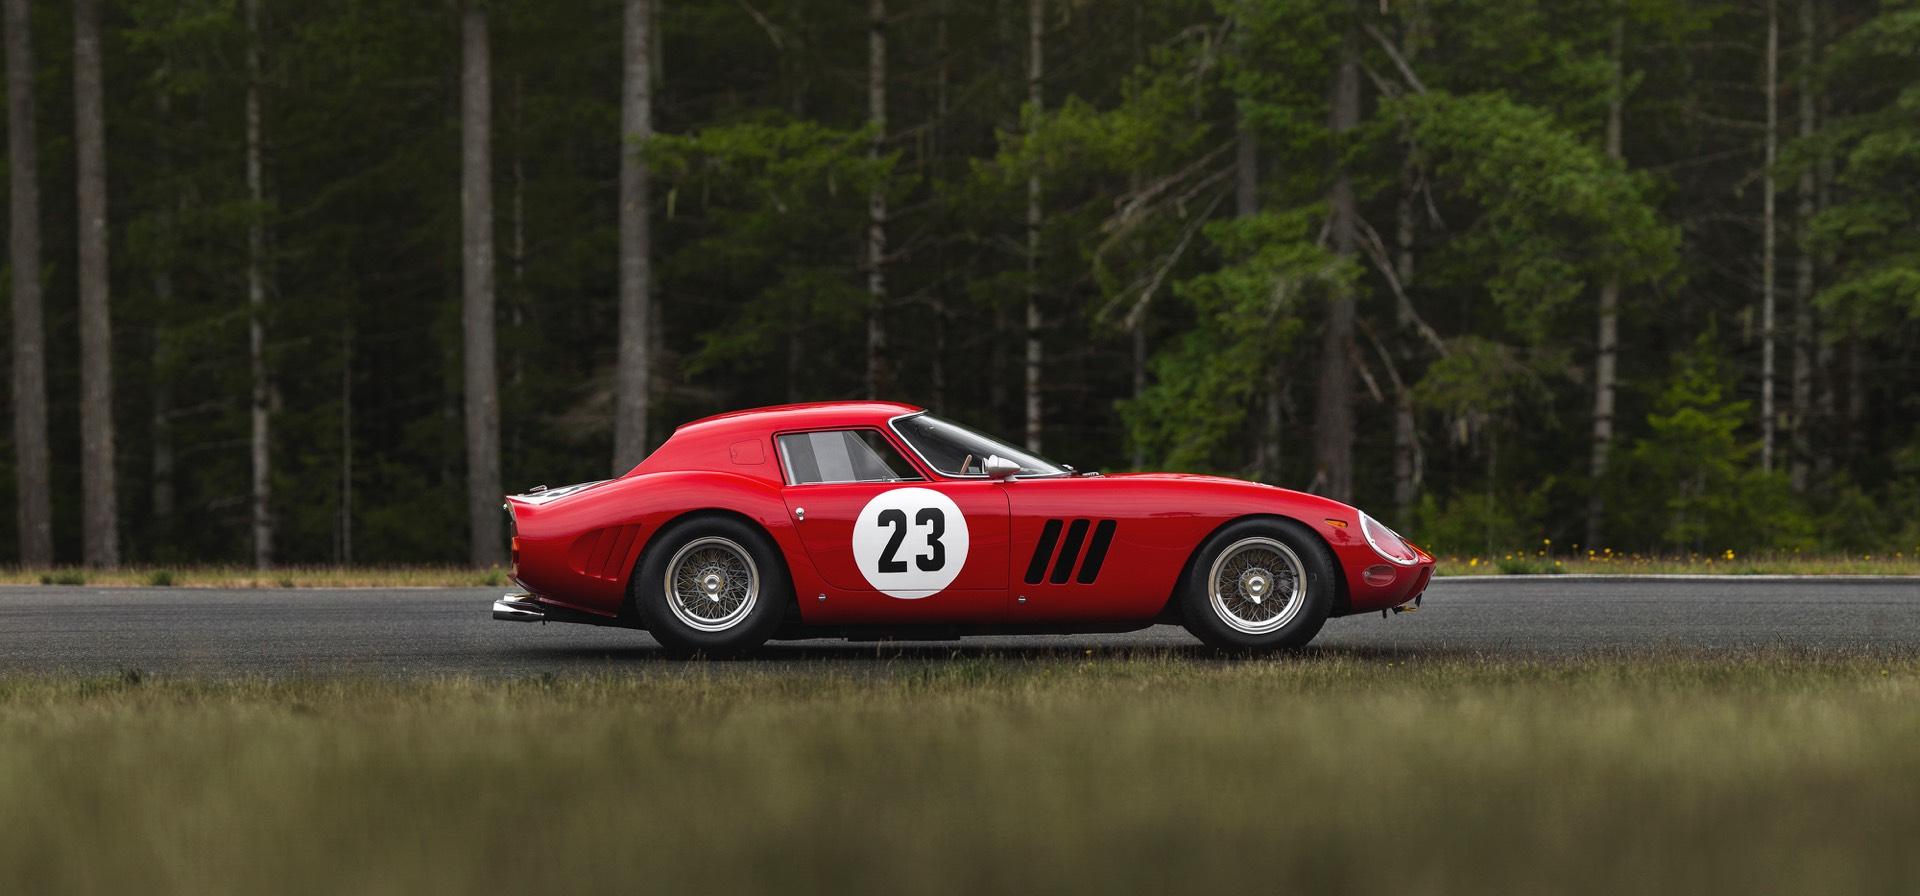 Ferrari 250 GTO RM Sothebys Side